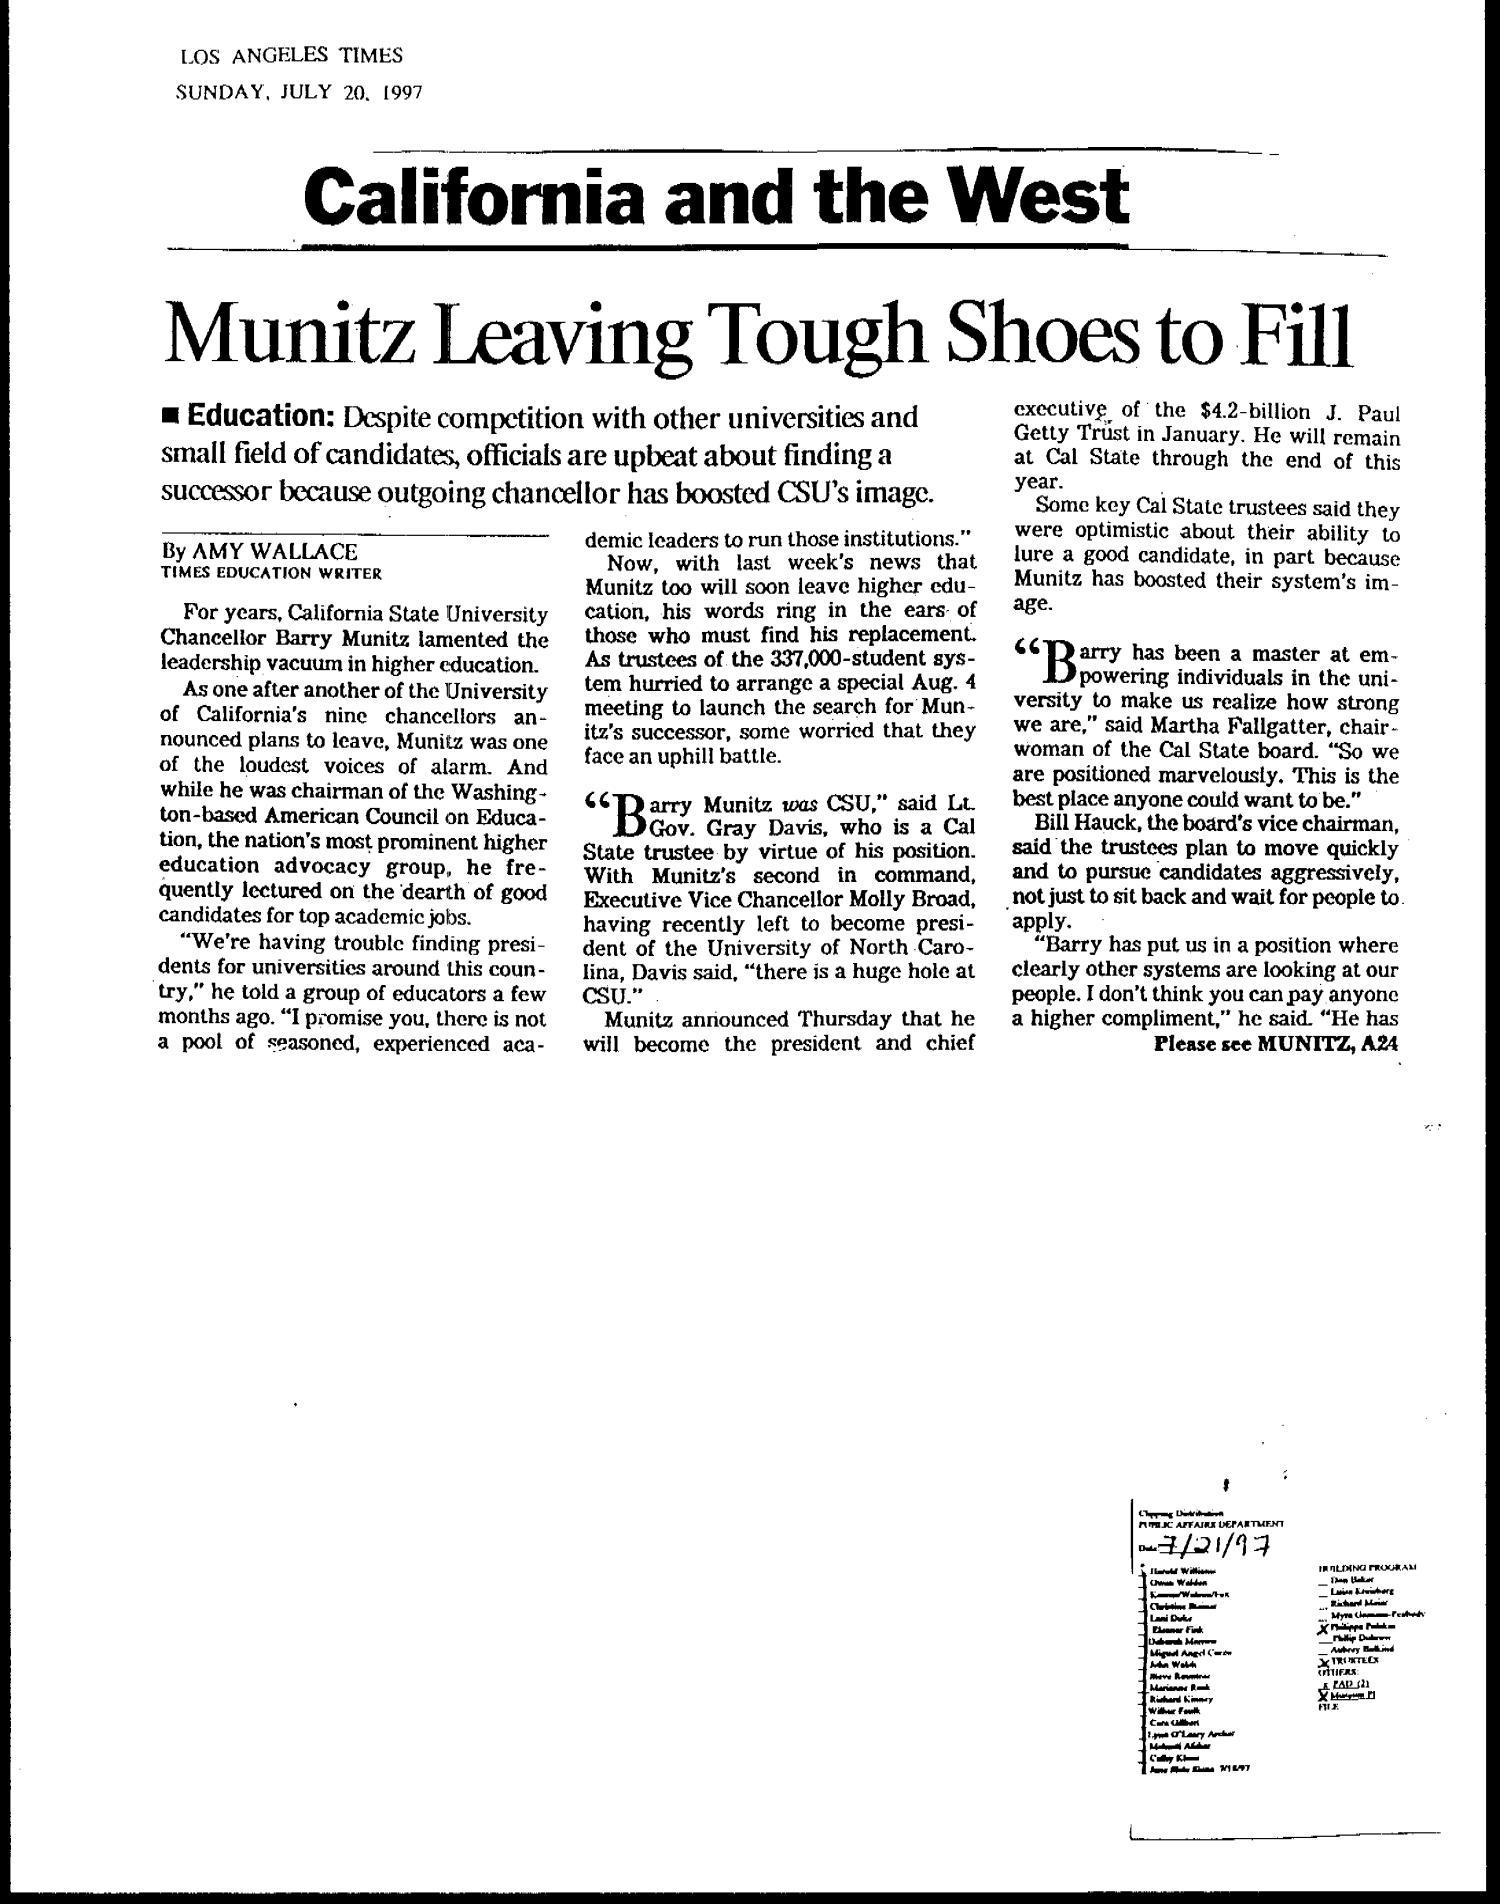 Munitz Leaving Tough Shoes to Fill - Digital Library